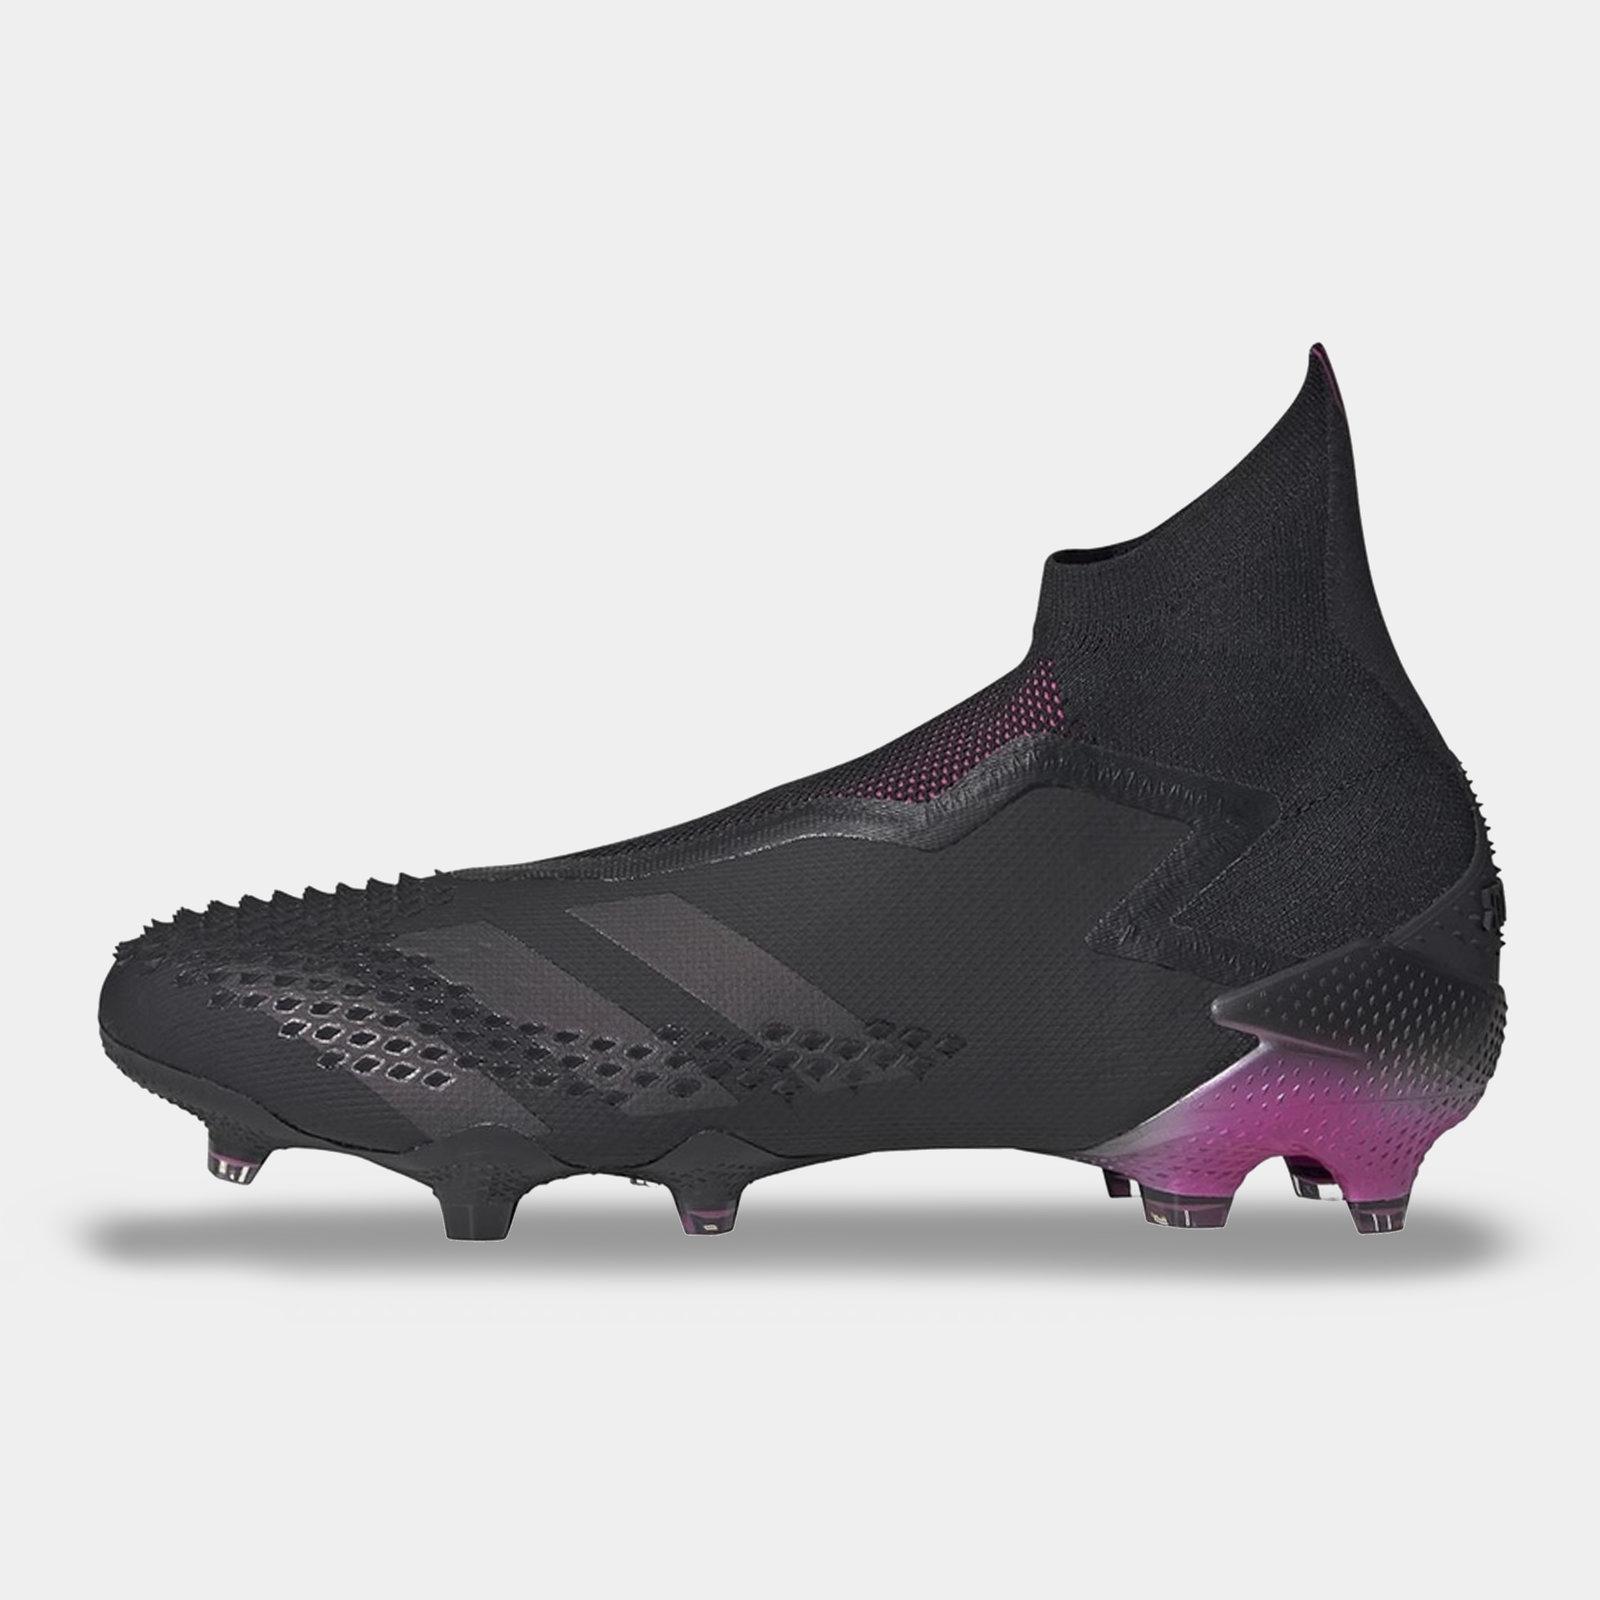 Predator 20 + FG Football Boots